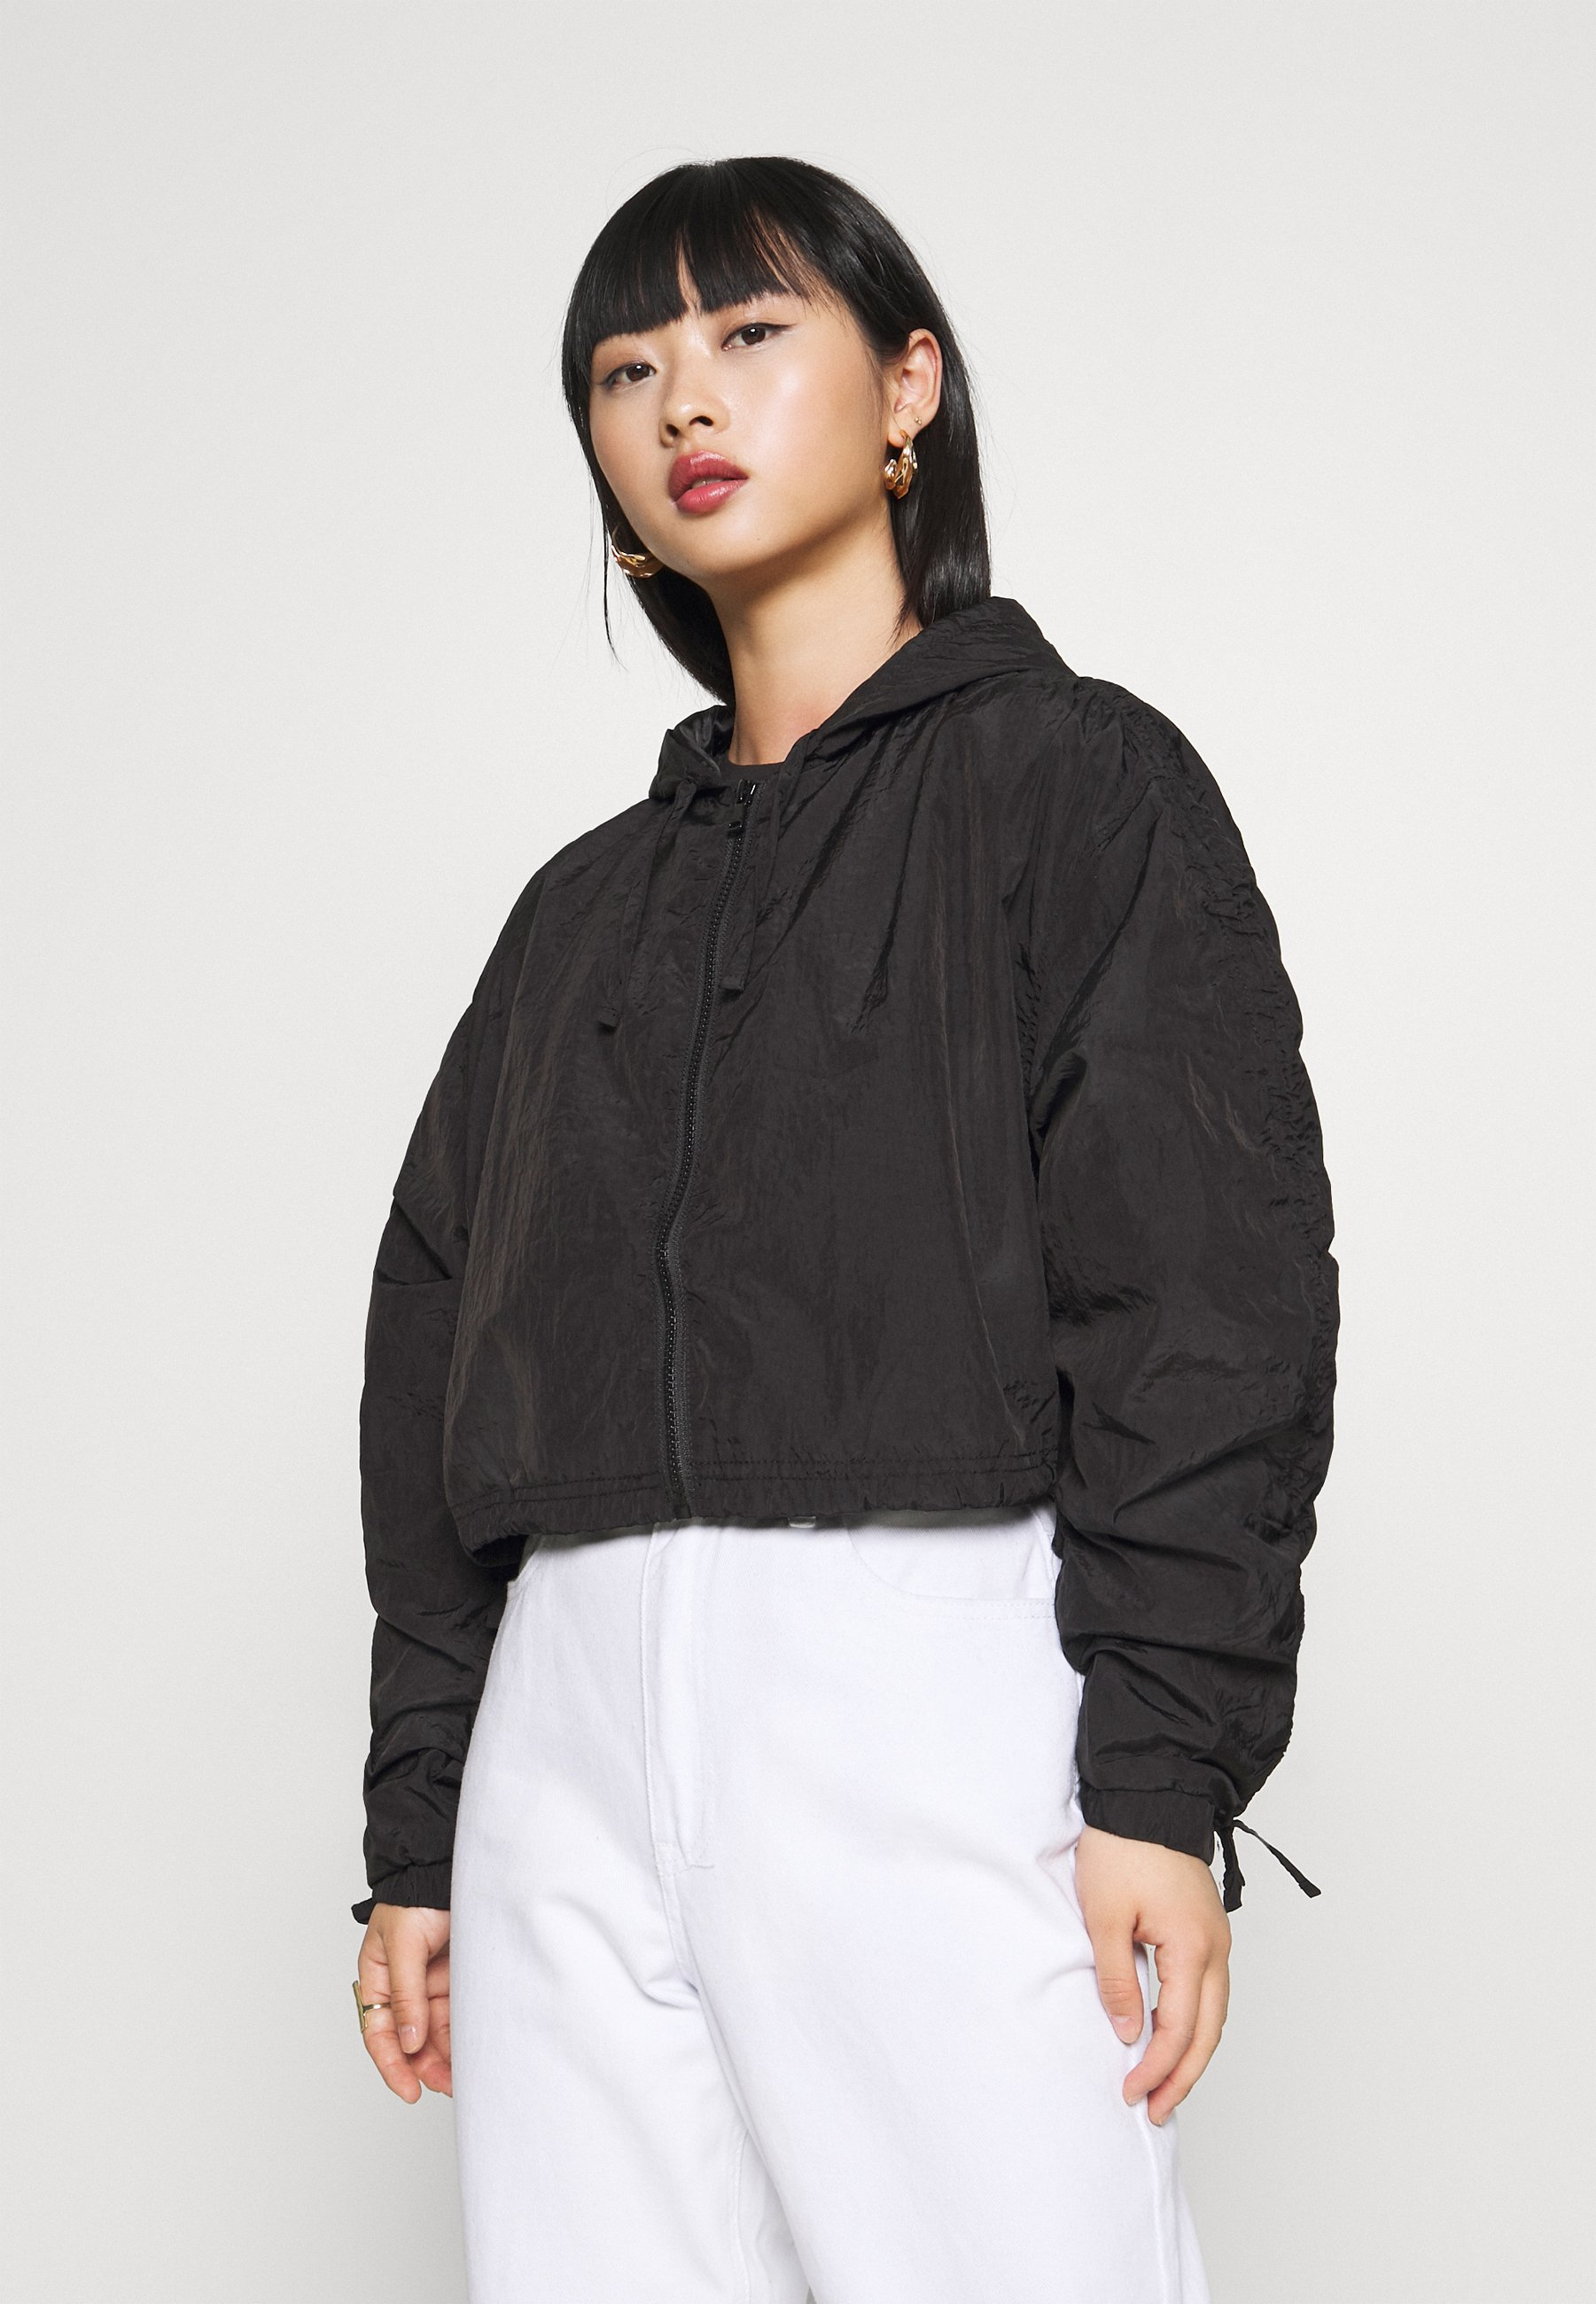 Topshop Petite JOAN - Bomberjacke - black | Damenbekleidung billig